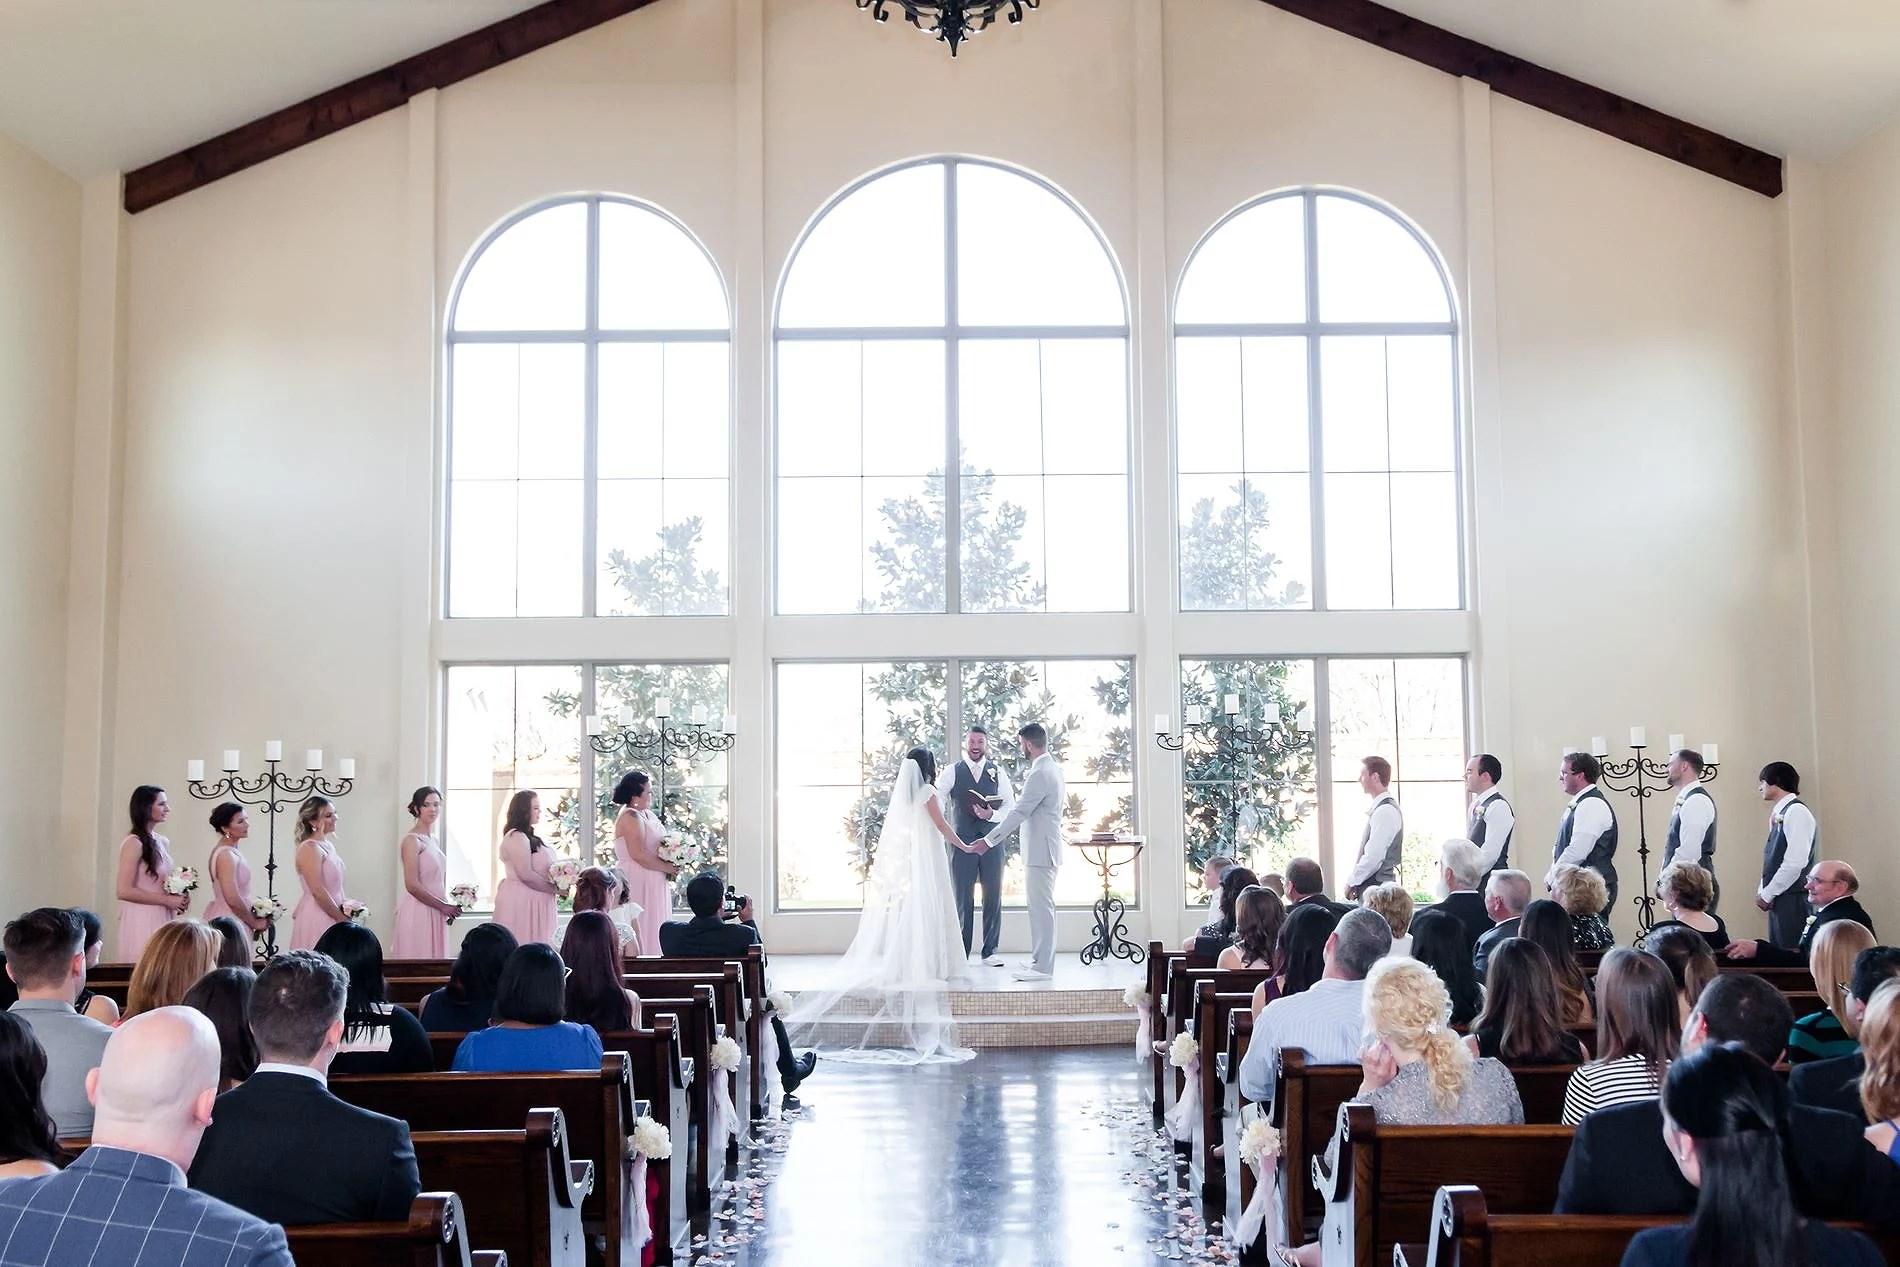 Bröllop x3